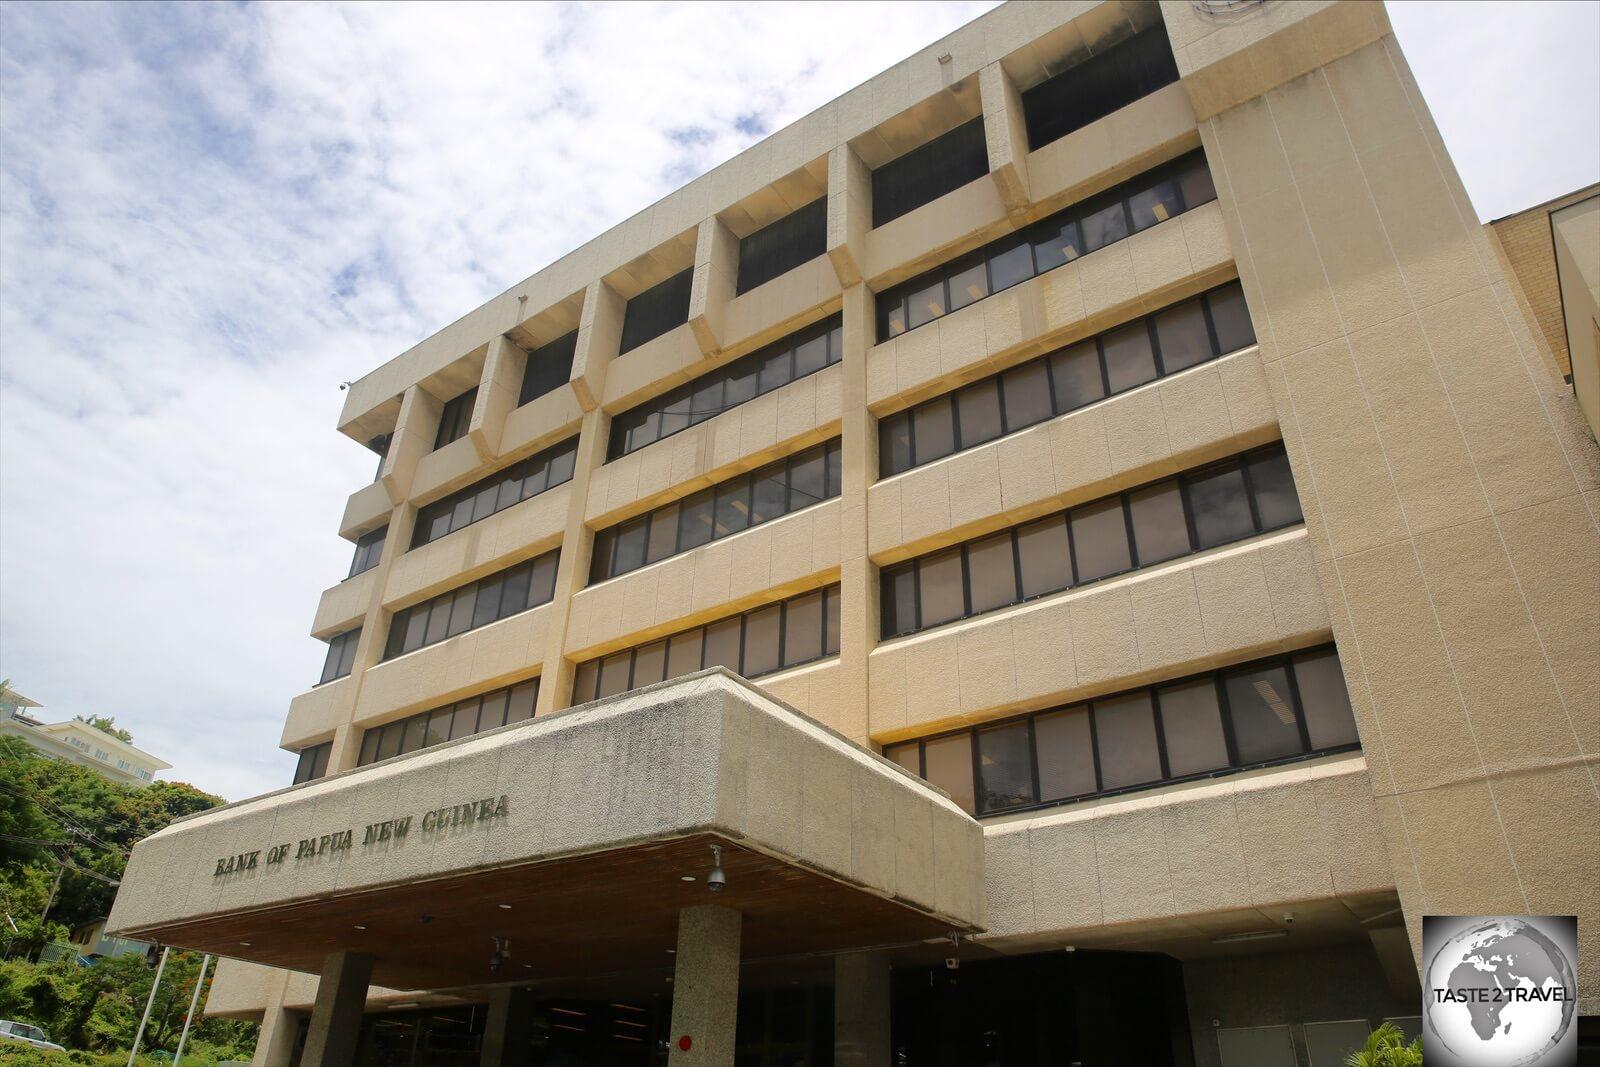 Bank of Papua New Guinea Headquarters, Port Moresby.